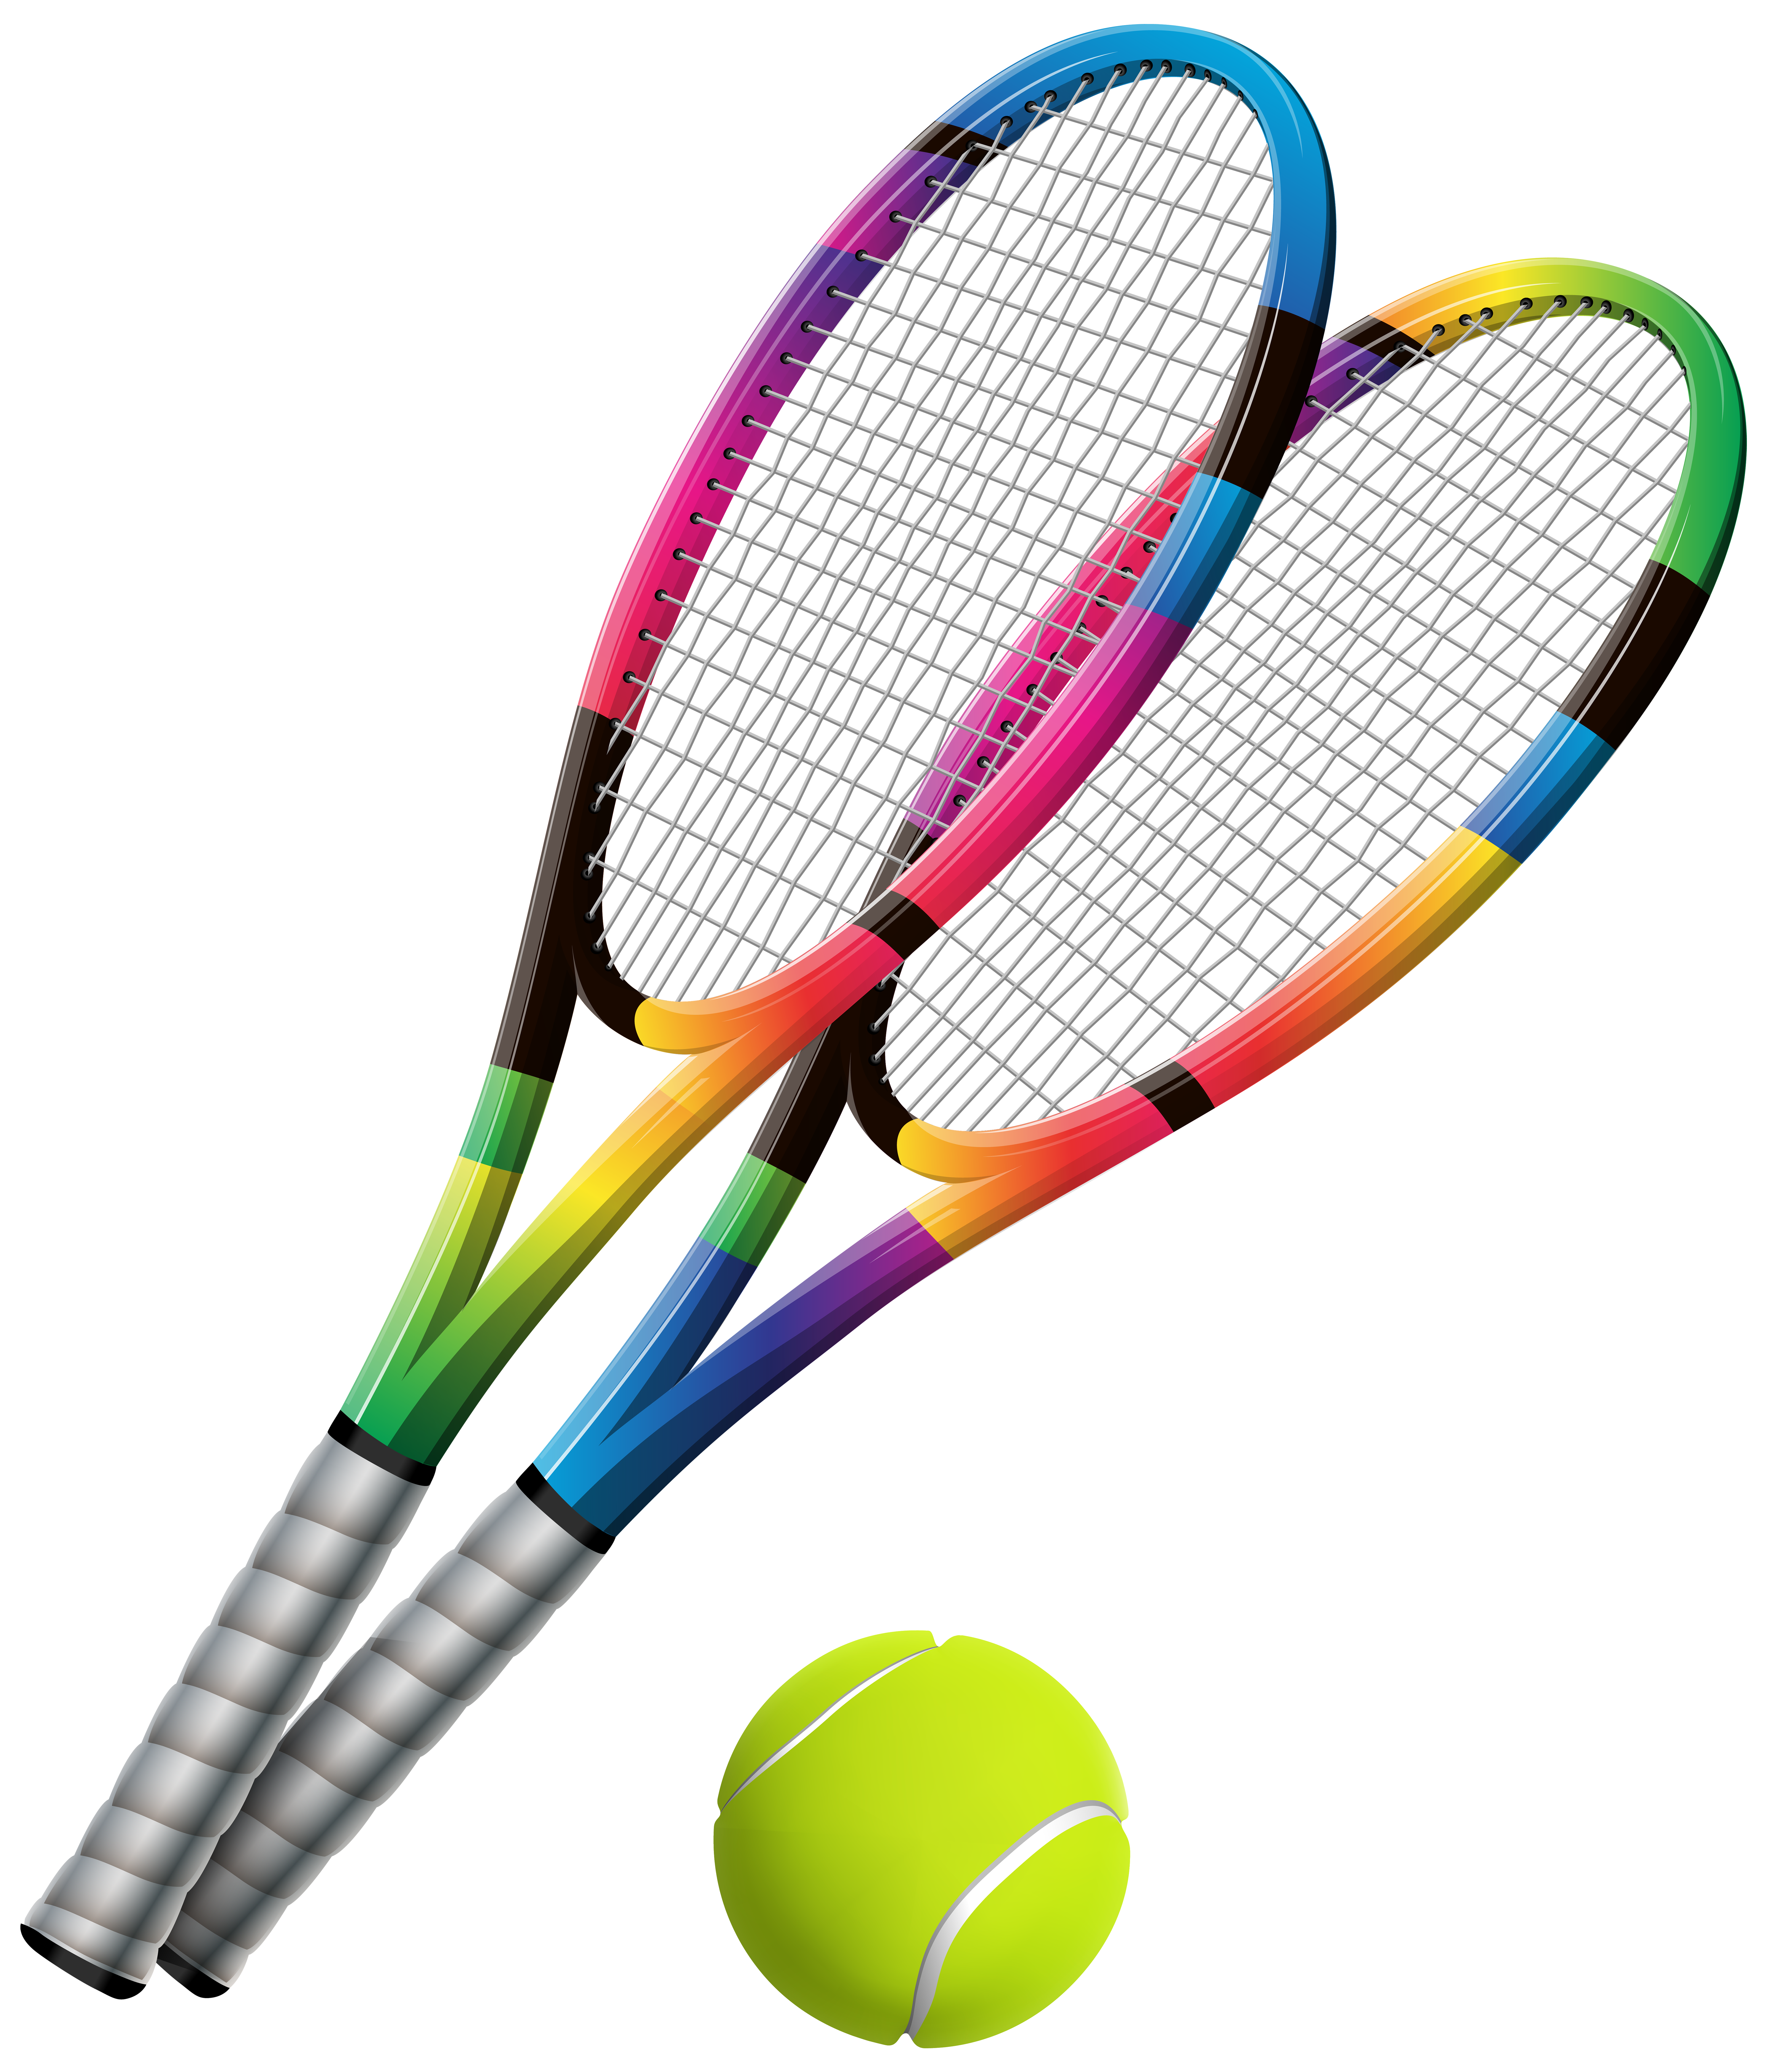 5968x7000 Tennis Rackets And Ball Transparent Png Clip Art